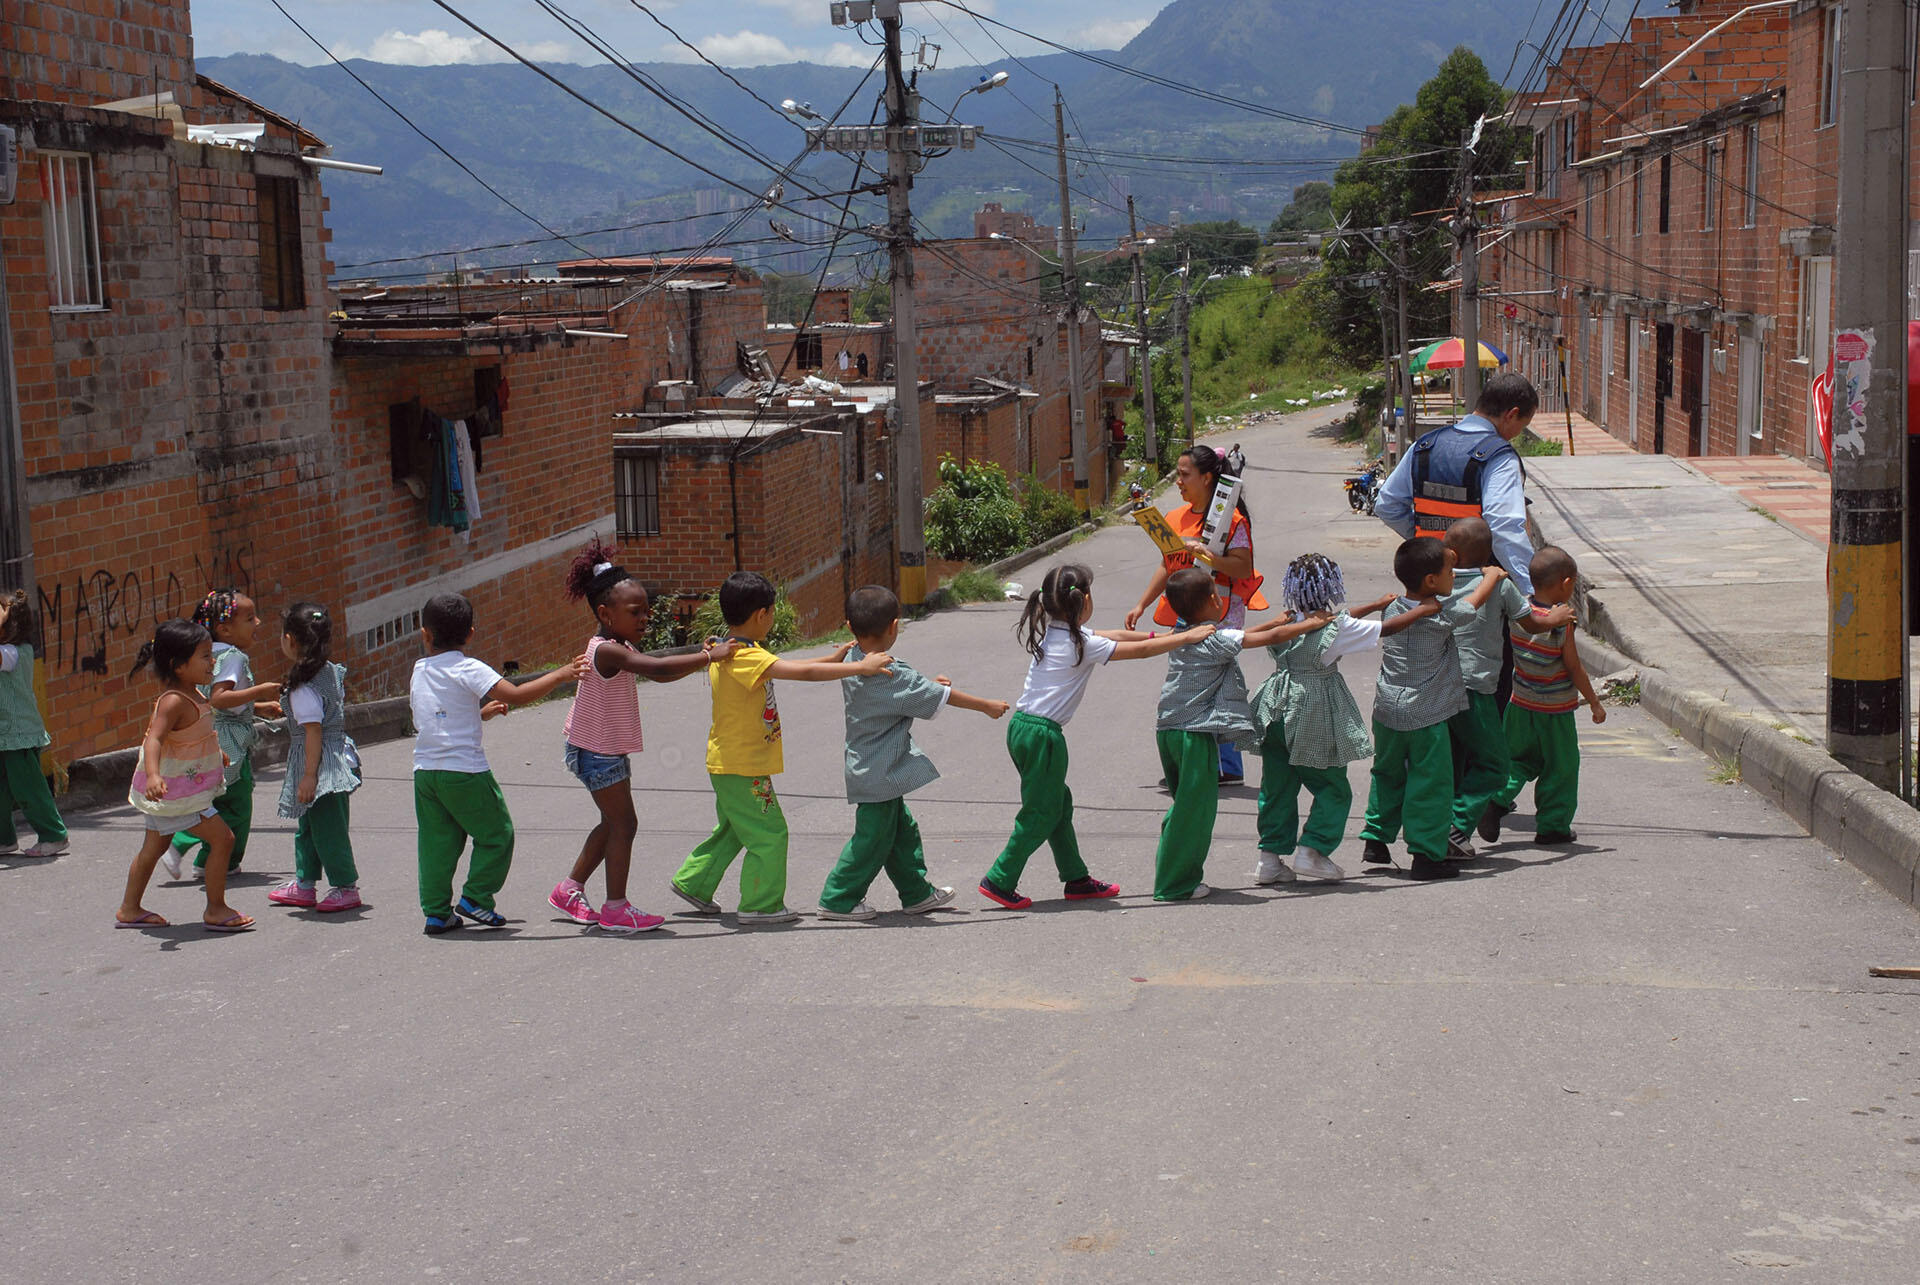 A group of colorfully clothed Medellín schoolchildren participate in an exercise program. (Photo courtesy of Secretaría de Movilidad de Medellín.)